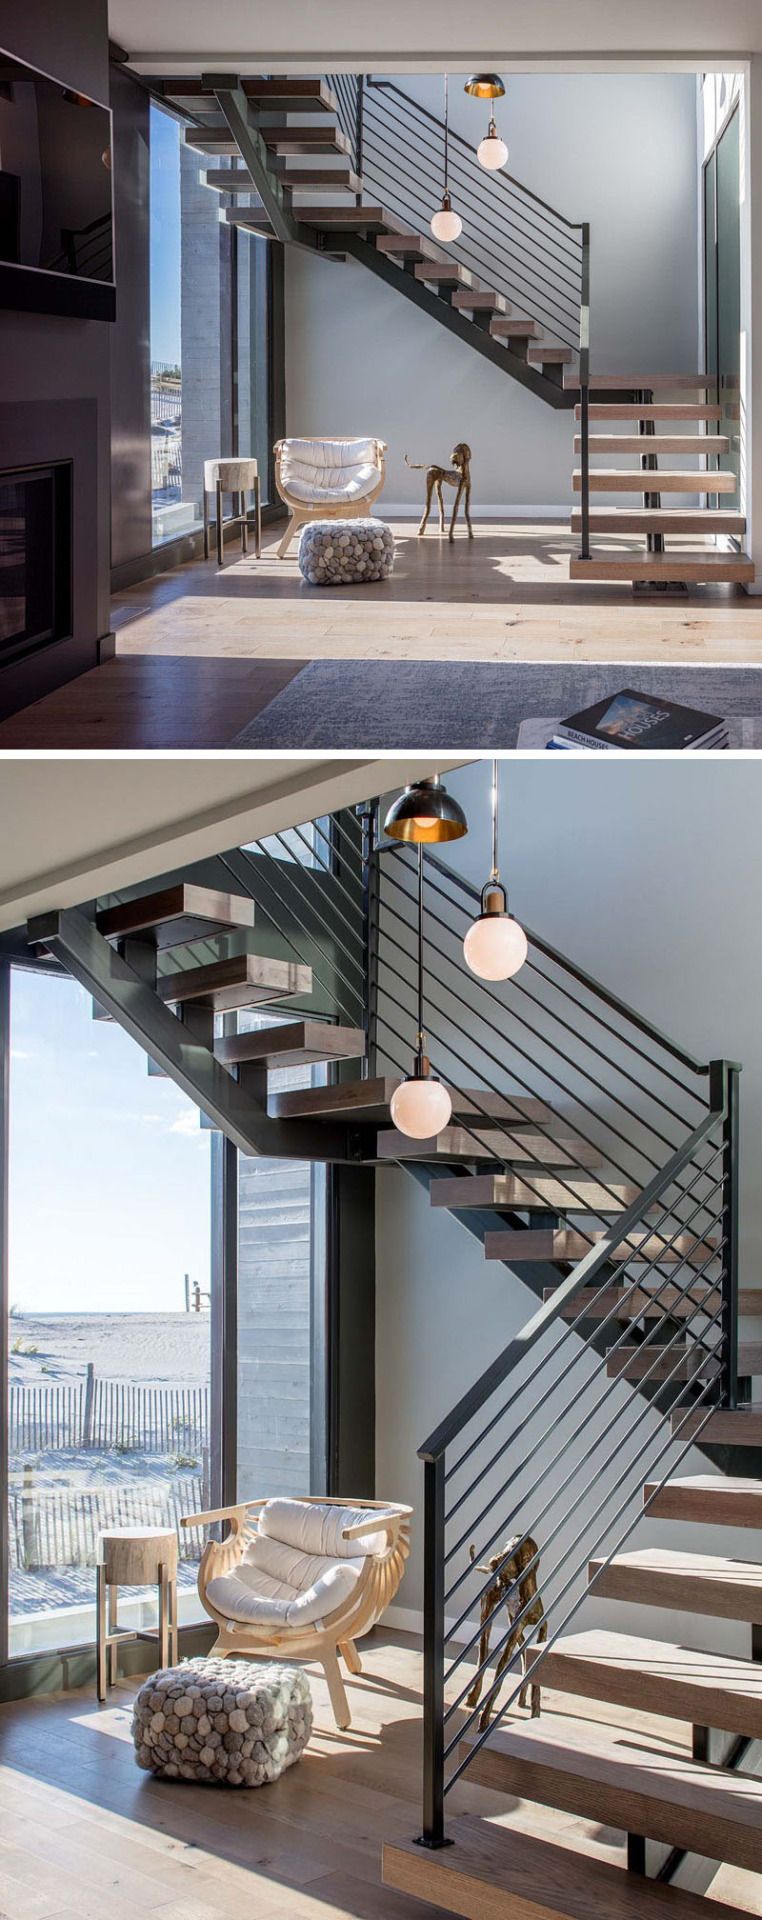 Archiemons u2022 This Modern Beach House Is